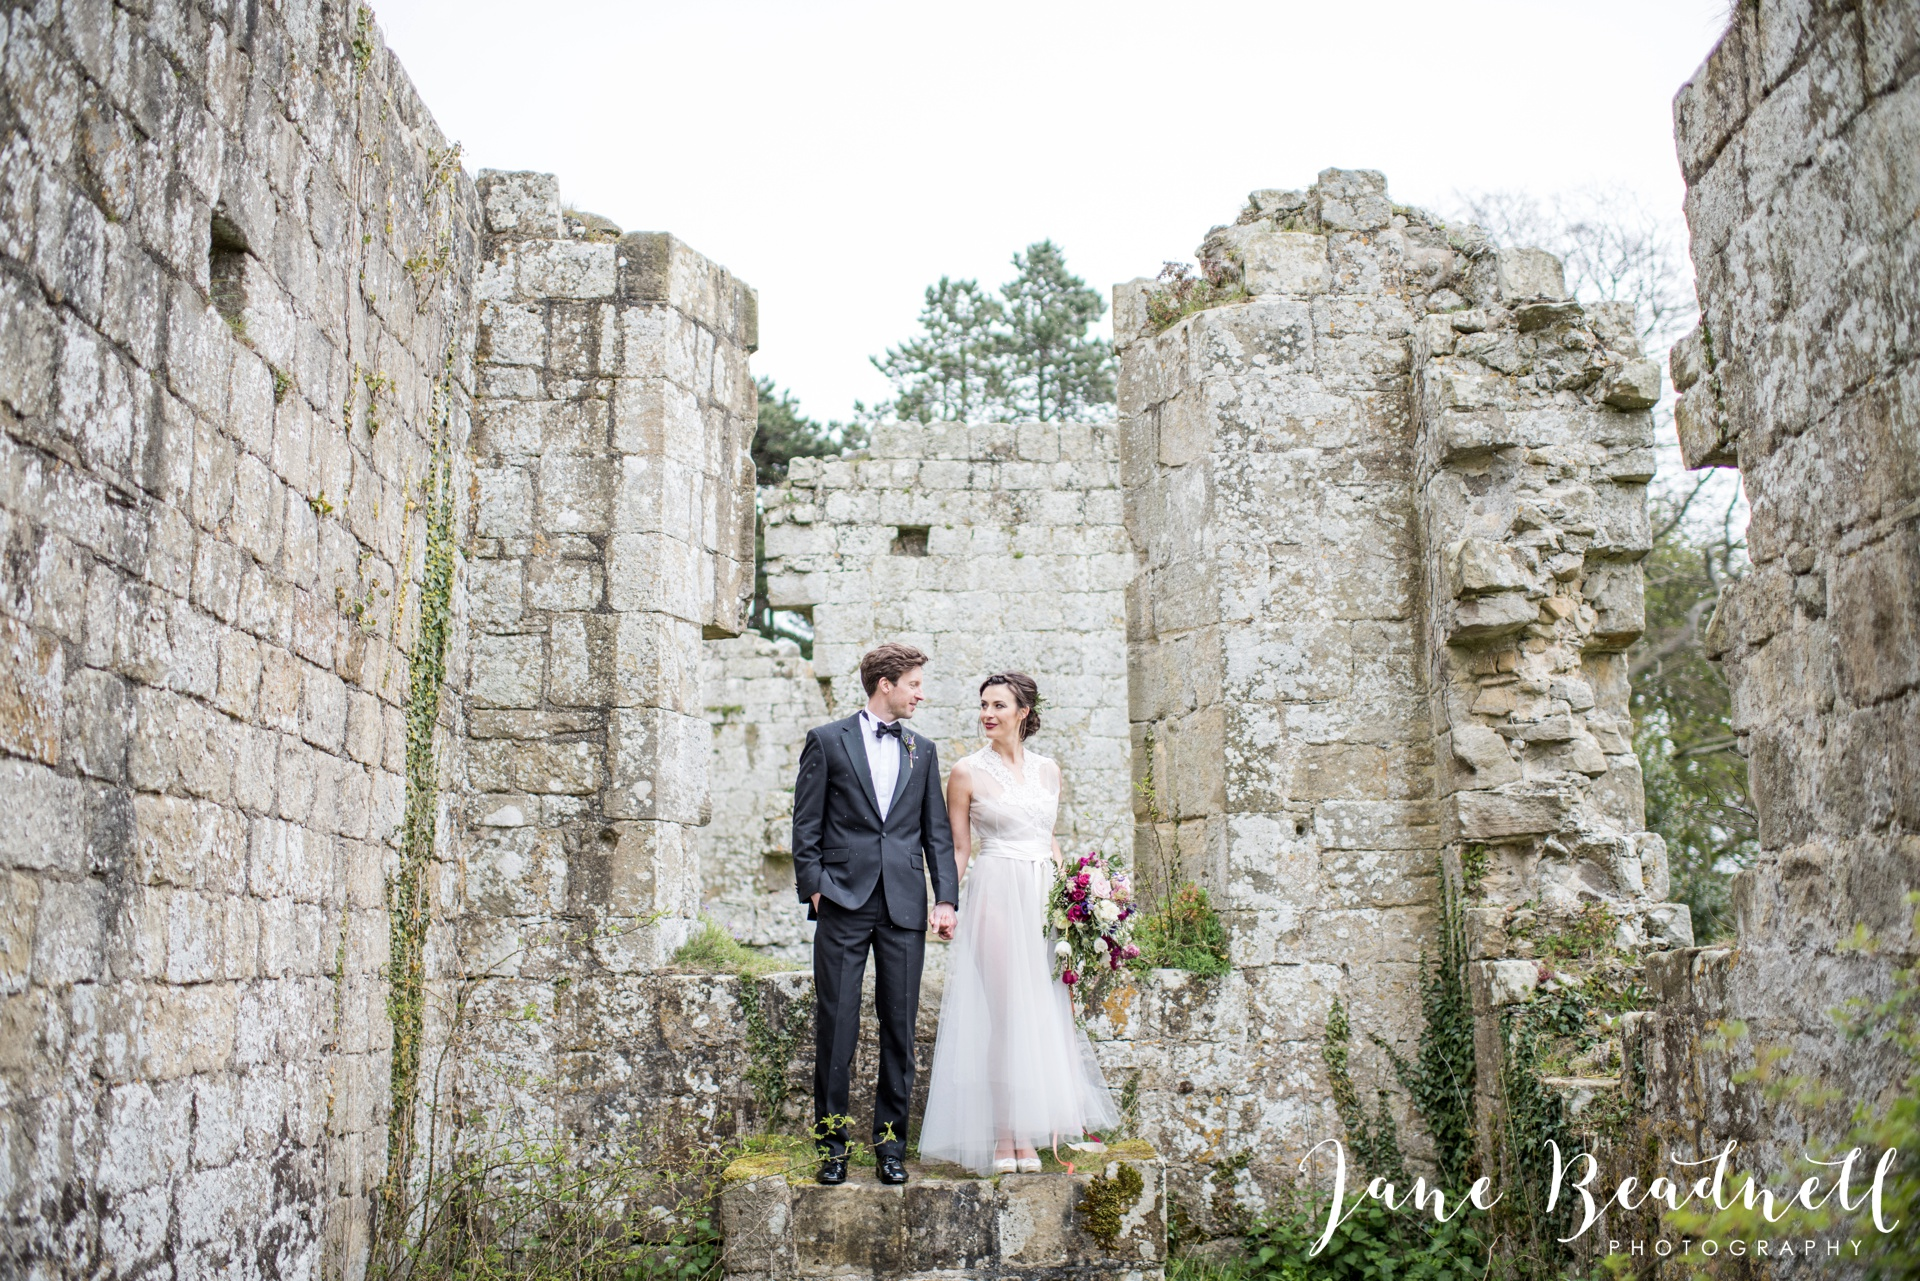 Jervaulx Abbey wedding photography fine art Yorkshire wedding photographer jane beadnell_0038